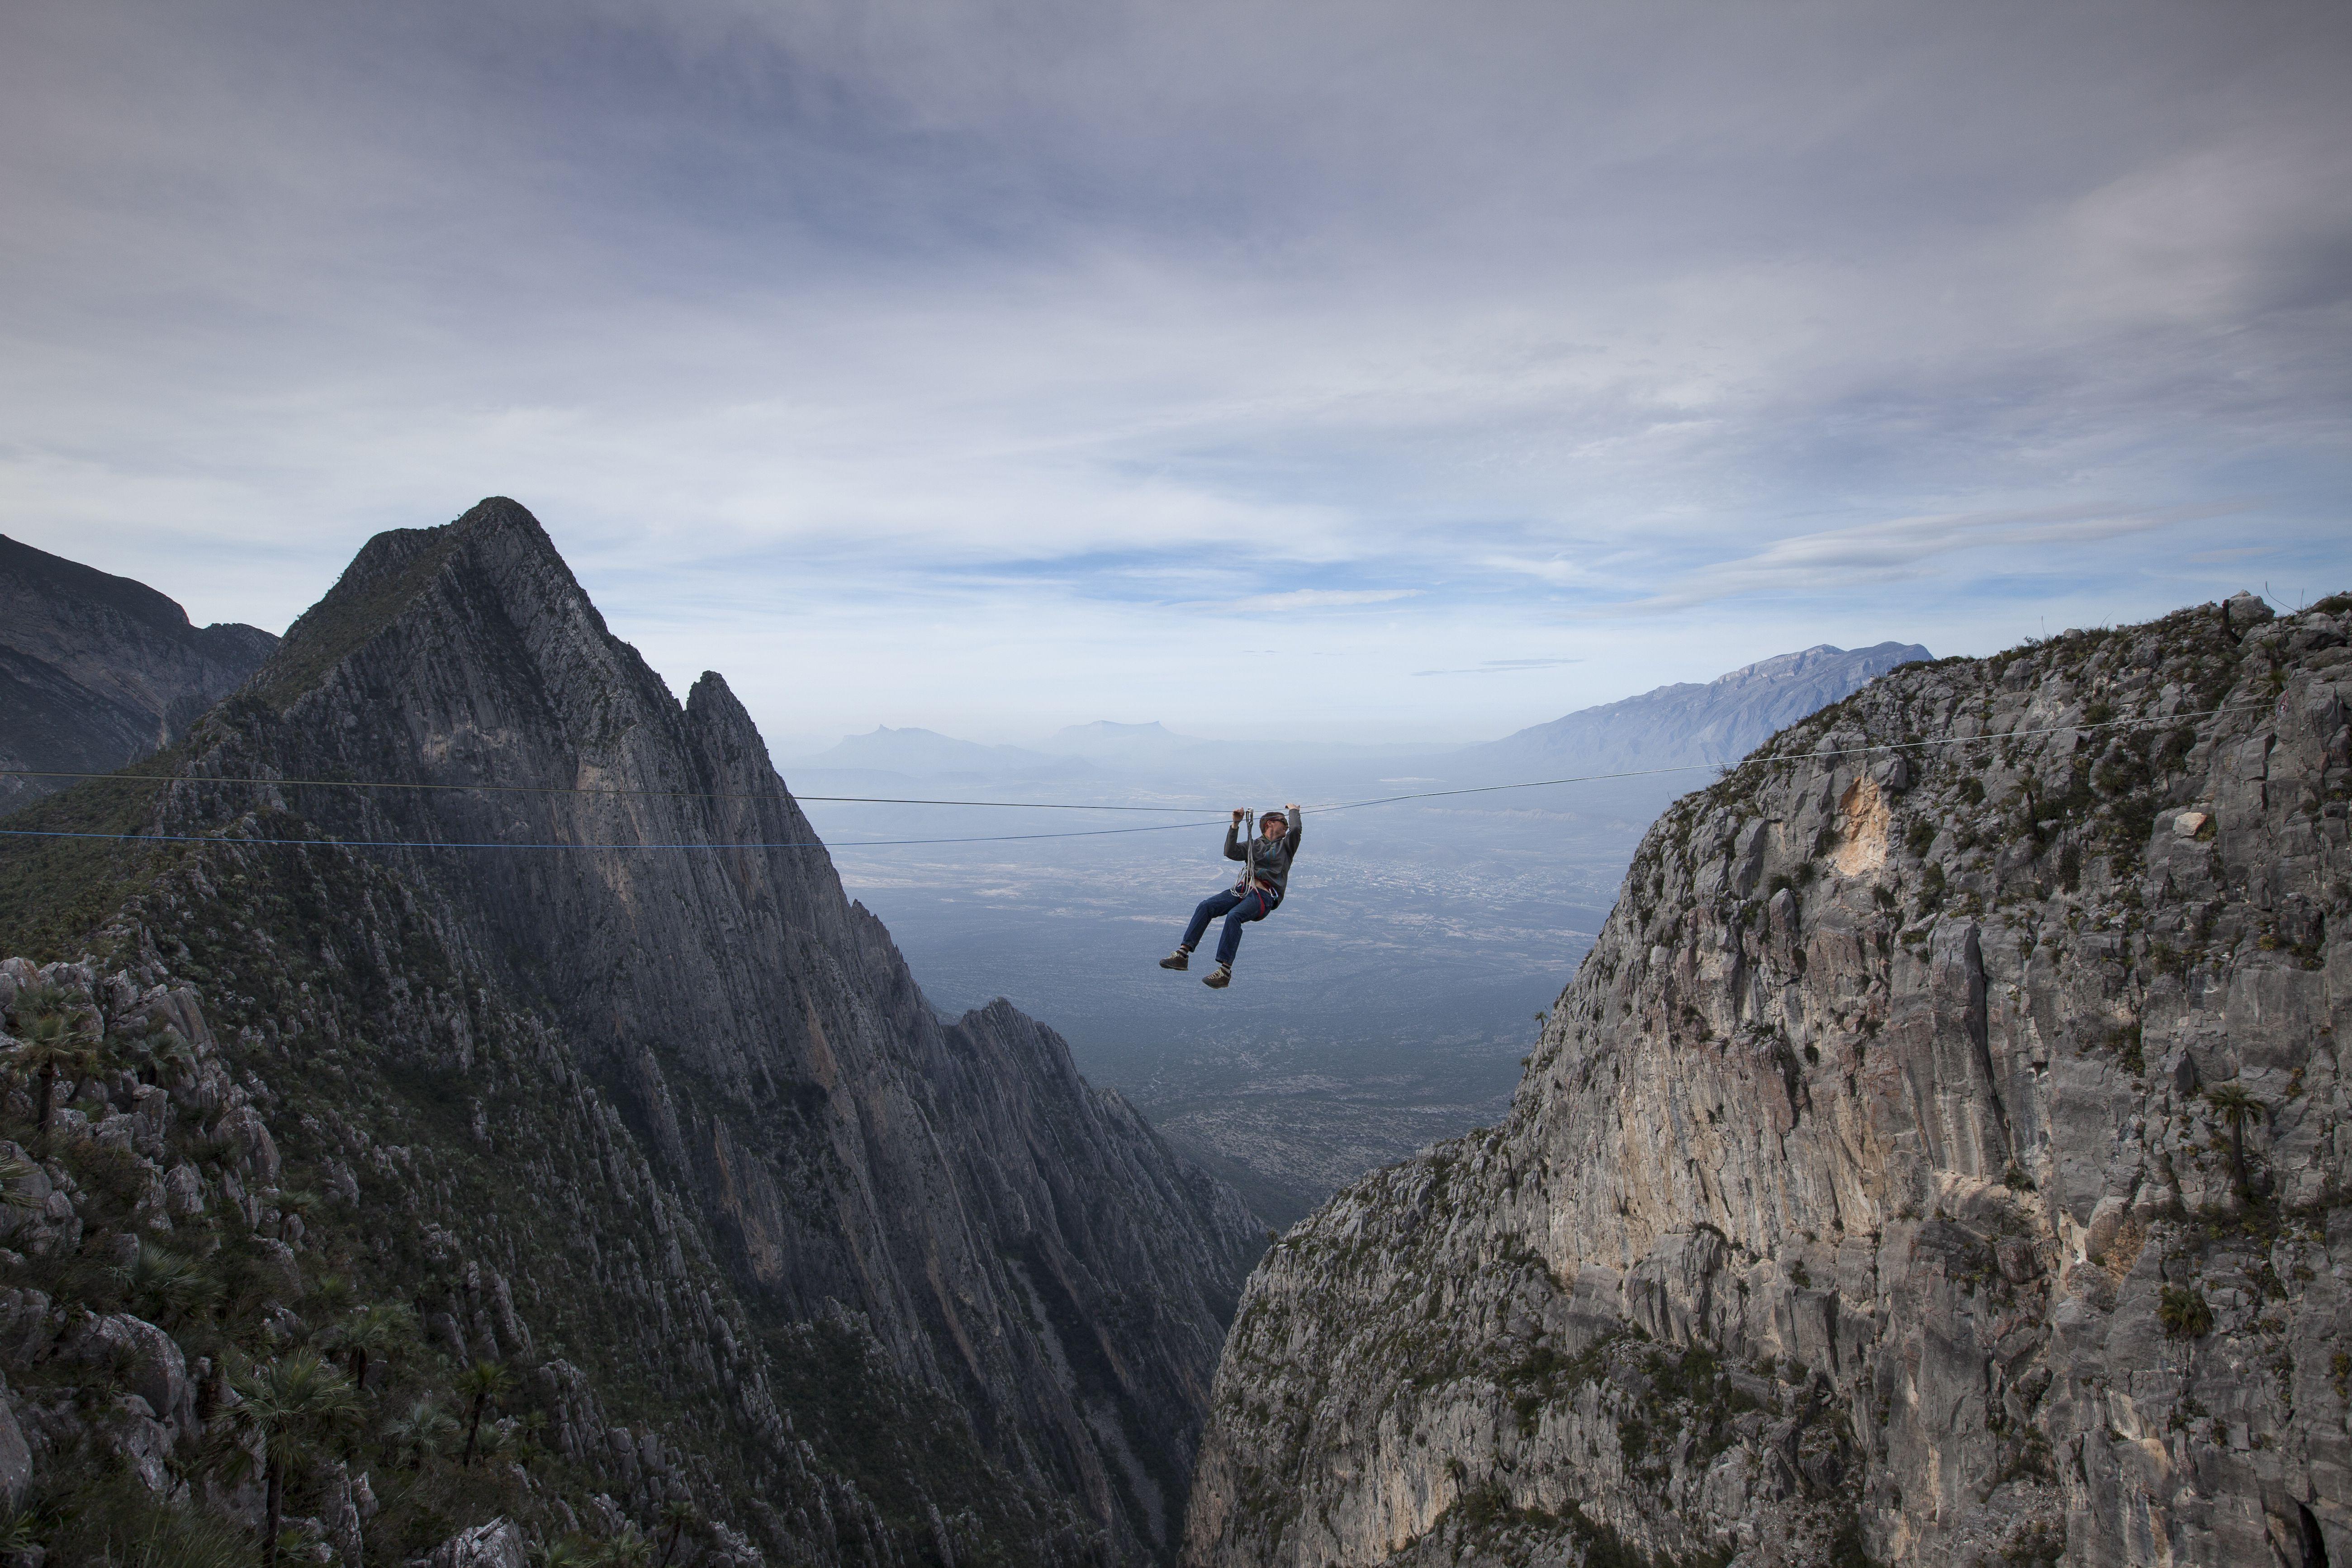 Man Zip Lines Across Canyon